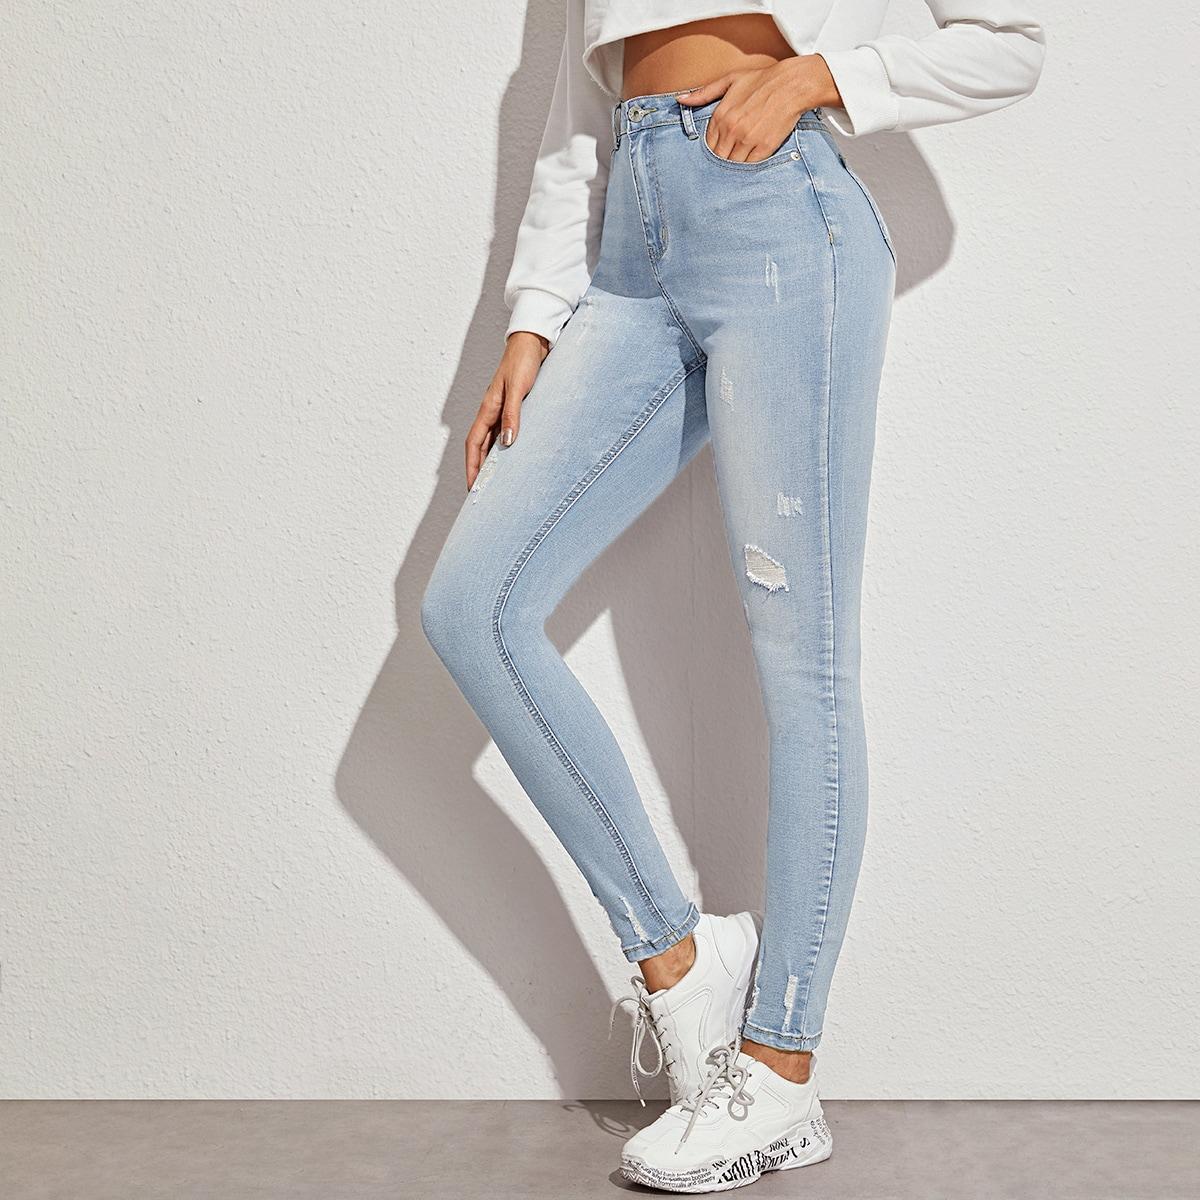 Light Wash High-Waisted High Stretch Slant Pocket Jeans